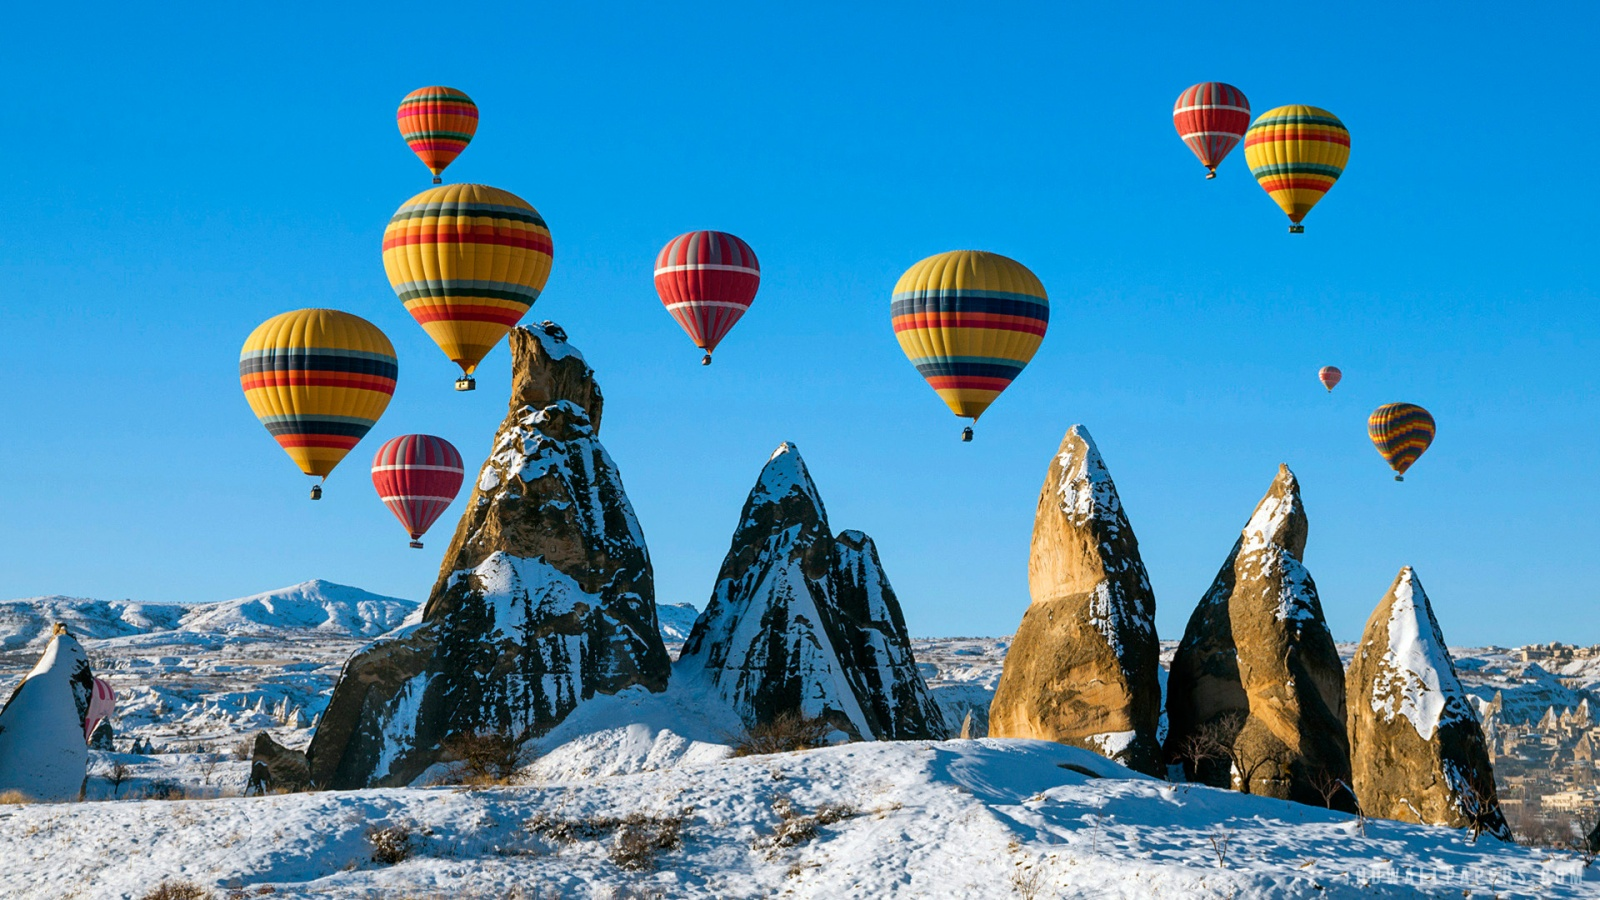 Balloons over Snowy Cappadocia Turkey HD Wallpaper   iHD Wallpapers 1600x900